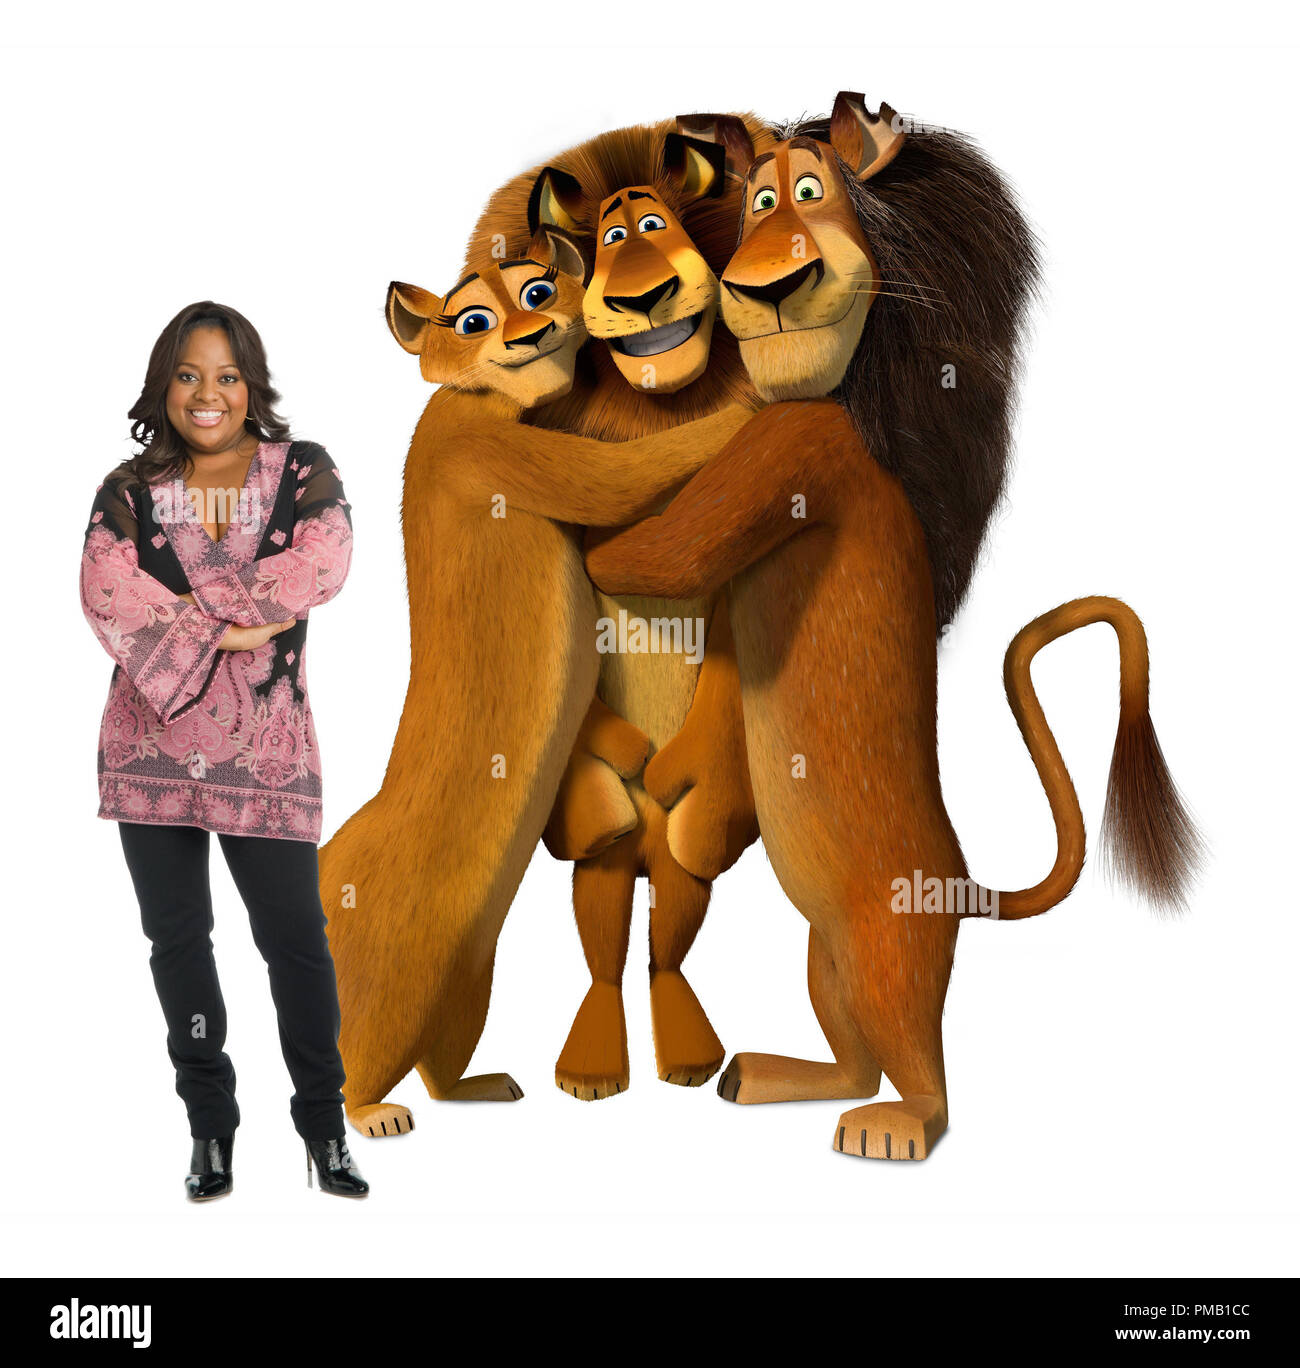 SHERRI SHEPHERD voices Alex's Mom (left) in DreamWorks